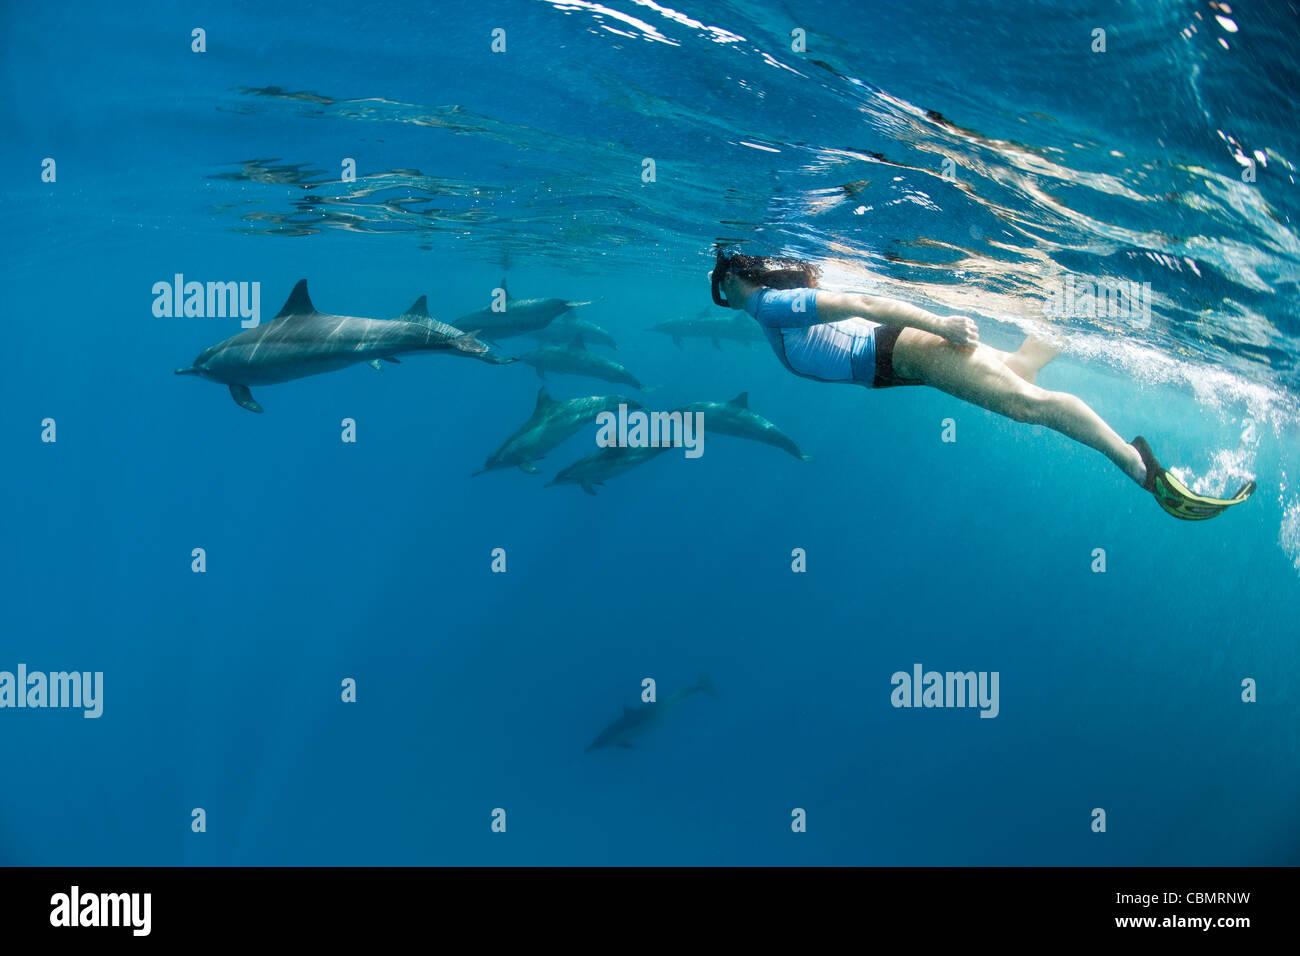 Bucear con Delfines, Stenella longirostris, Shaab Rumi, Mar Rojo, SudánFoto de stock